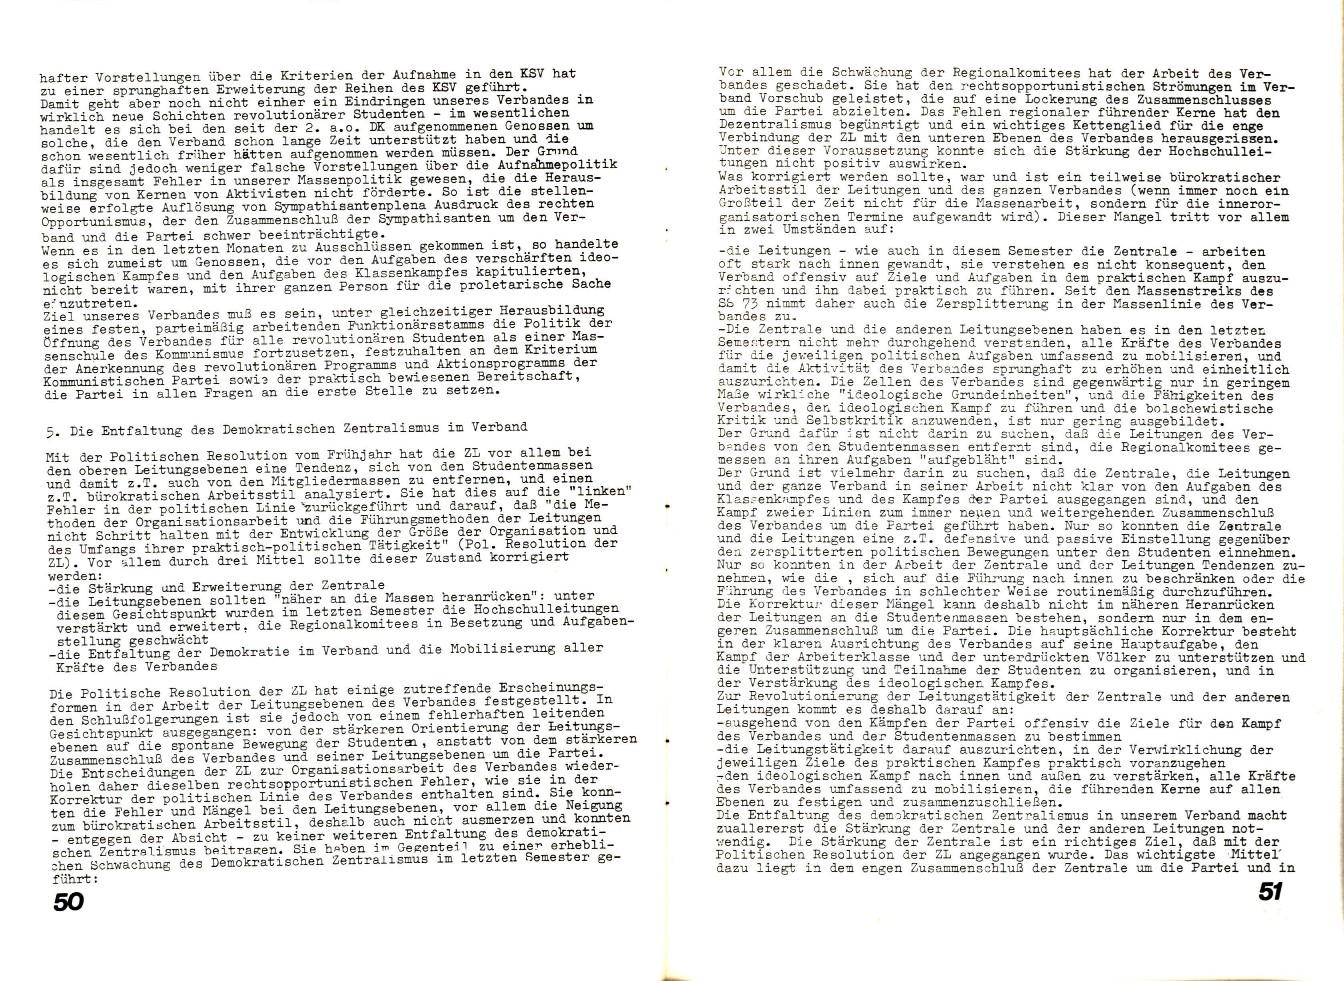 KSV_1974_Rechenschaftsbericht_27